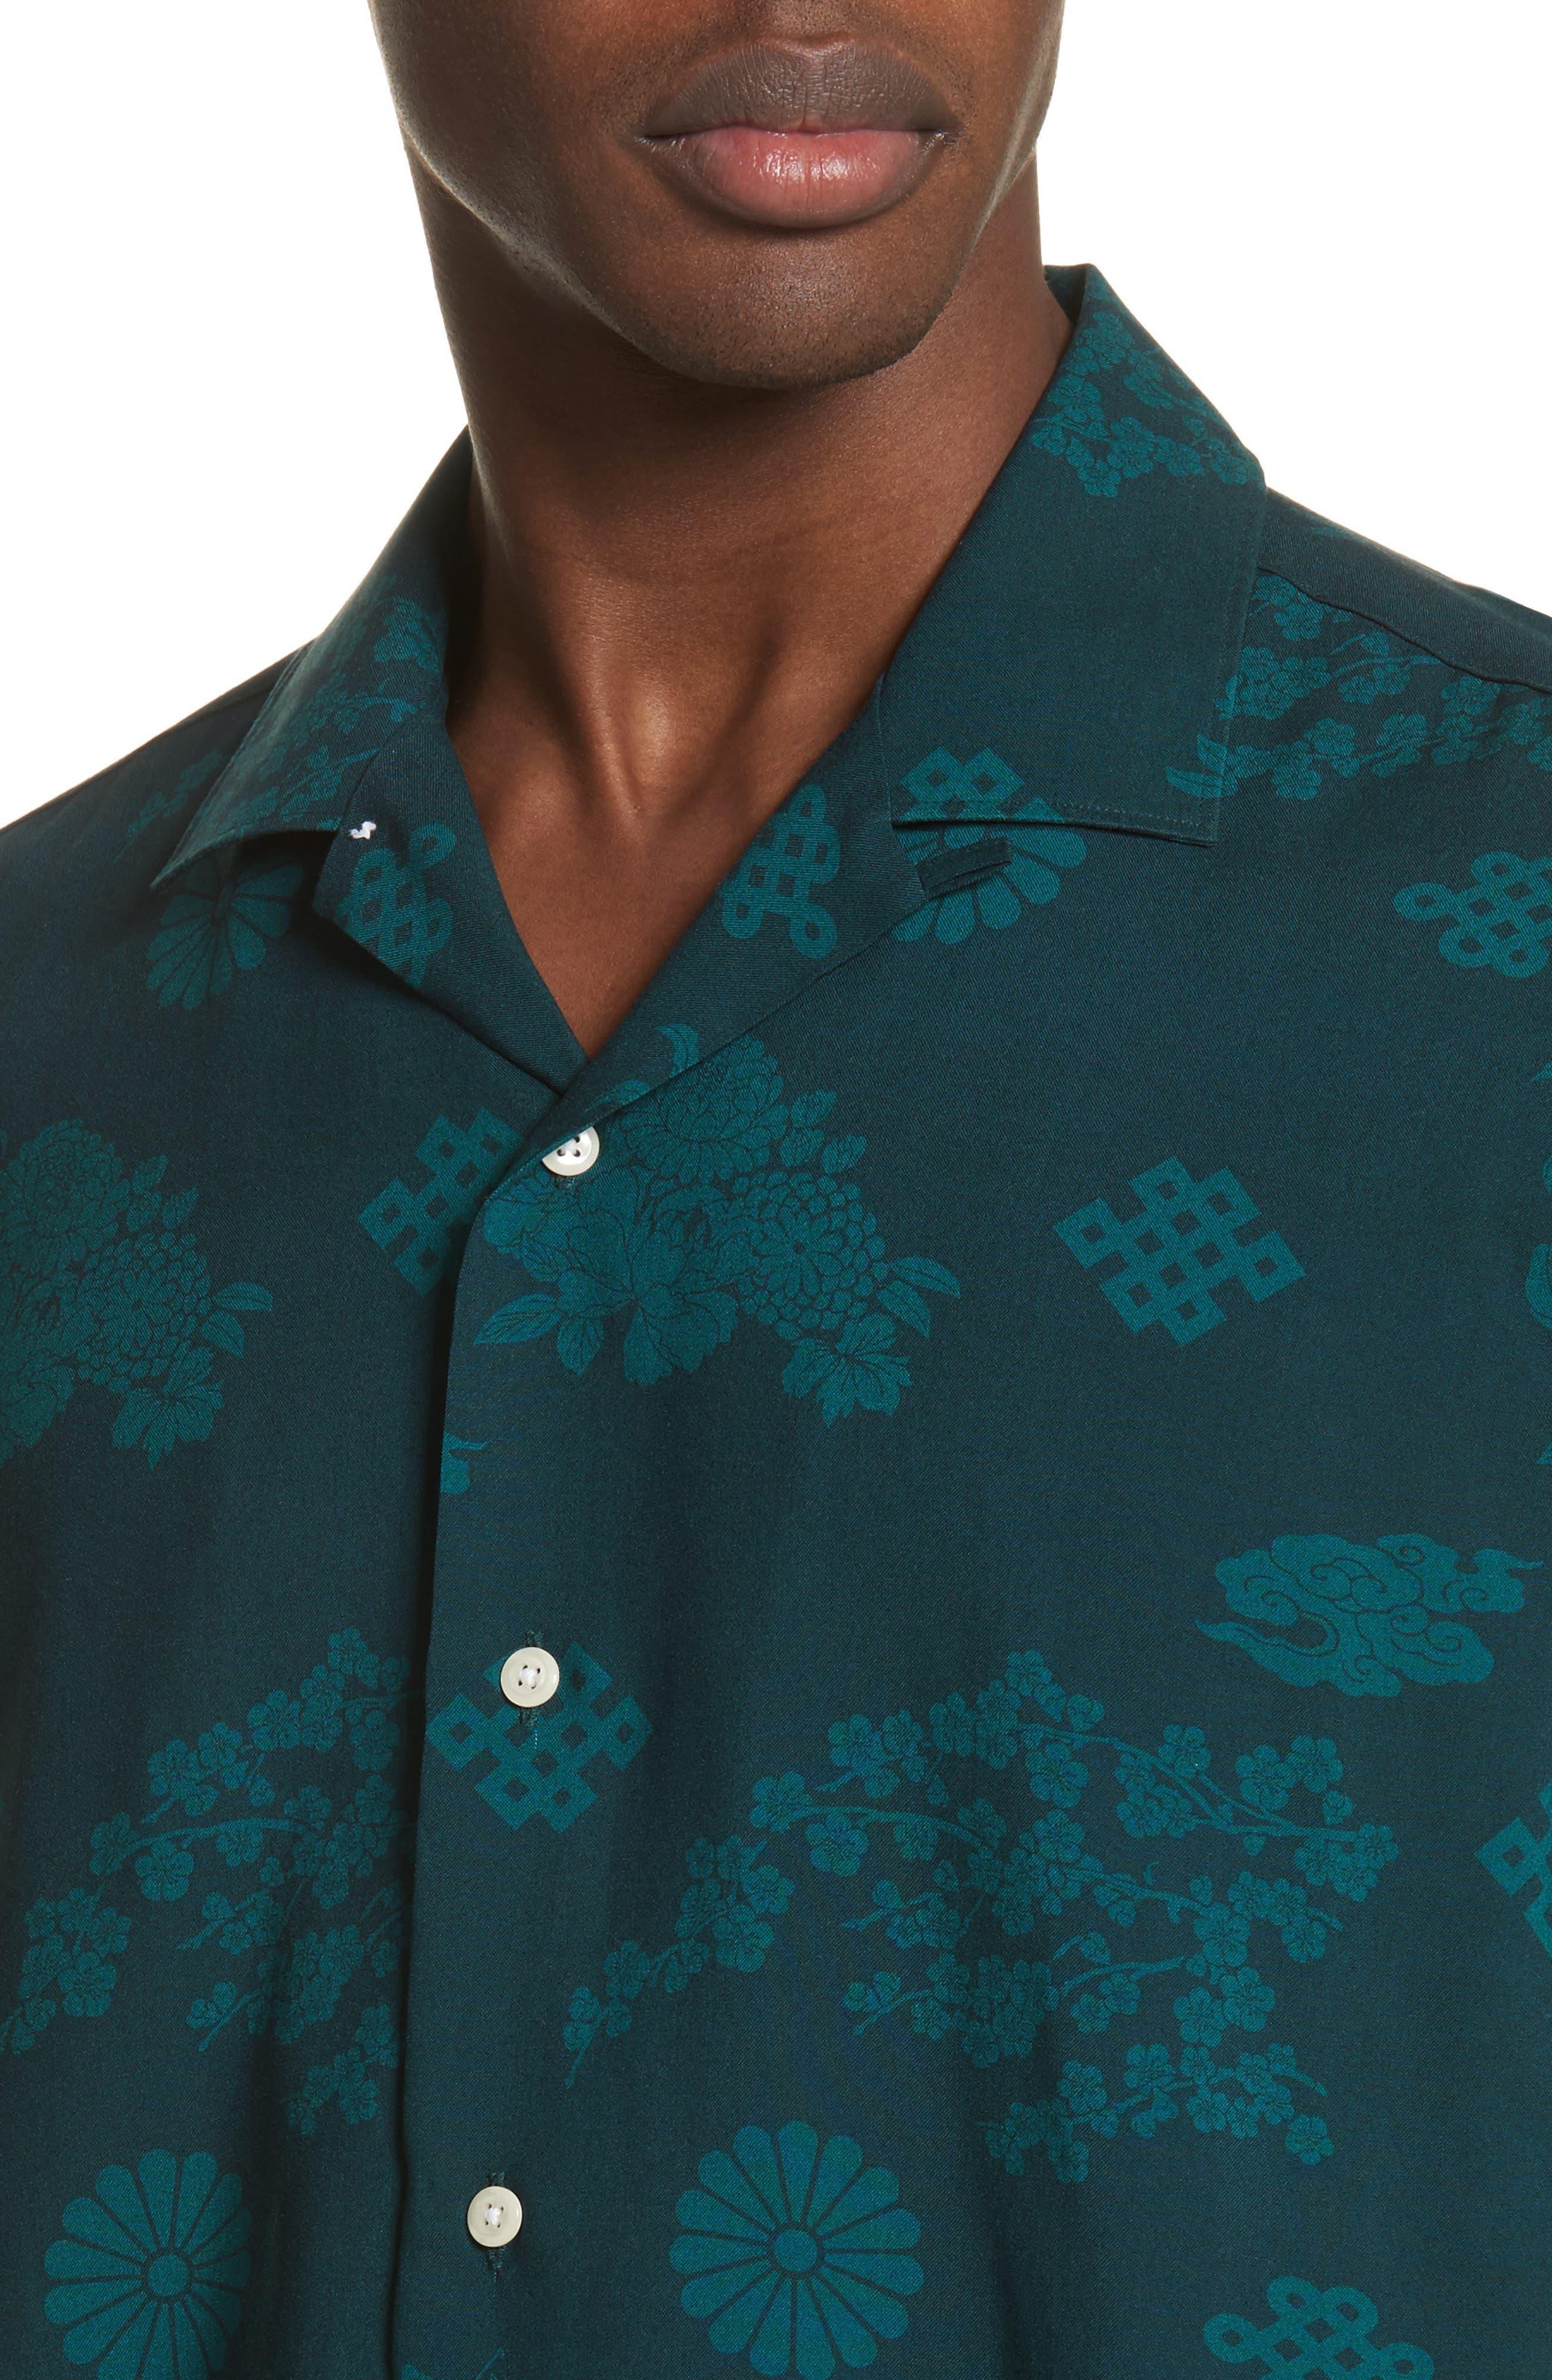 x The North Face Men's Floral Print Camp Shirt,                             Alternate thumbnail 5, color,                             300